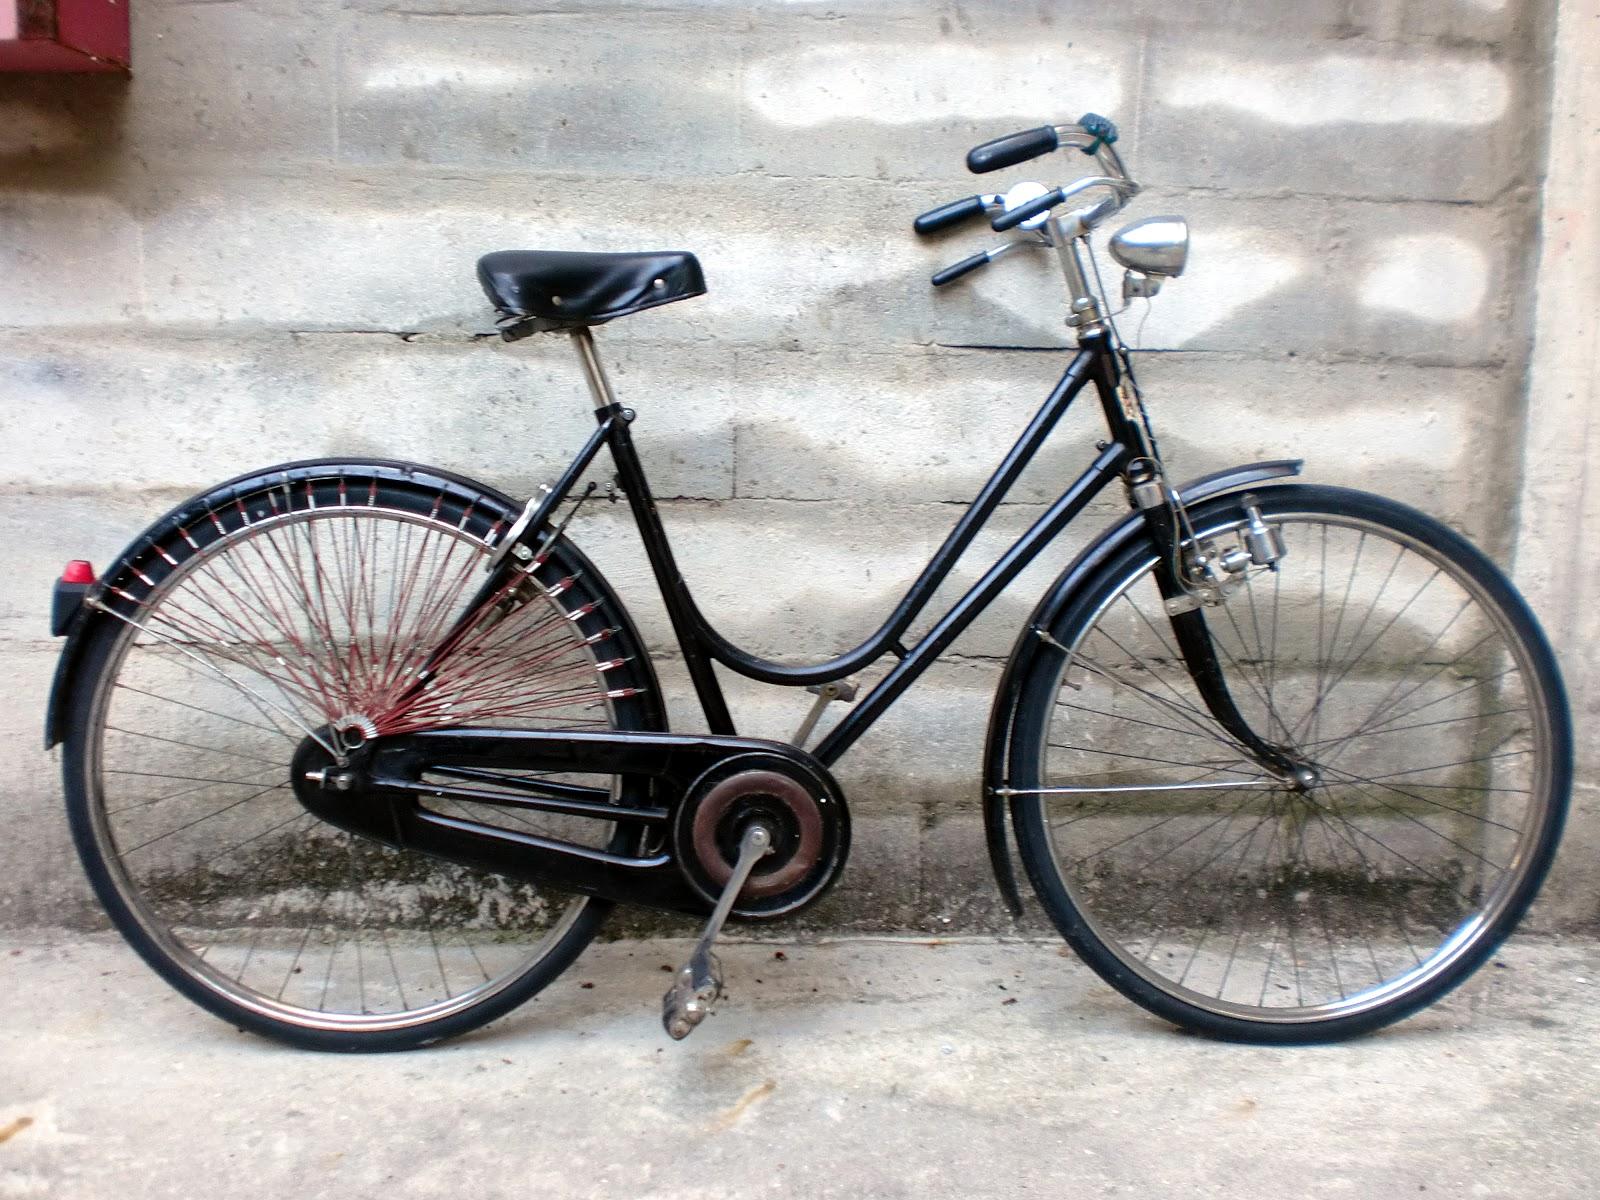 Officine 99 Bici Depoca Vintage E Old Style Riconvertite In